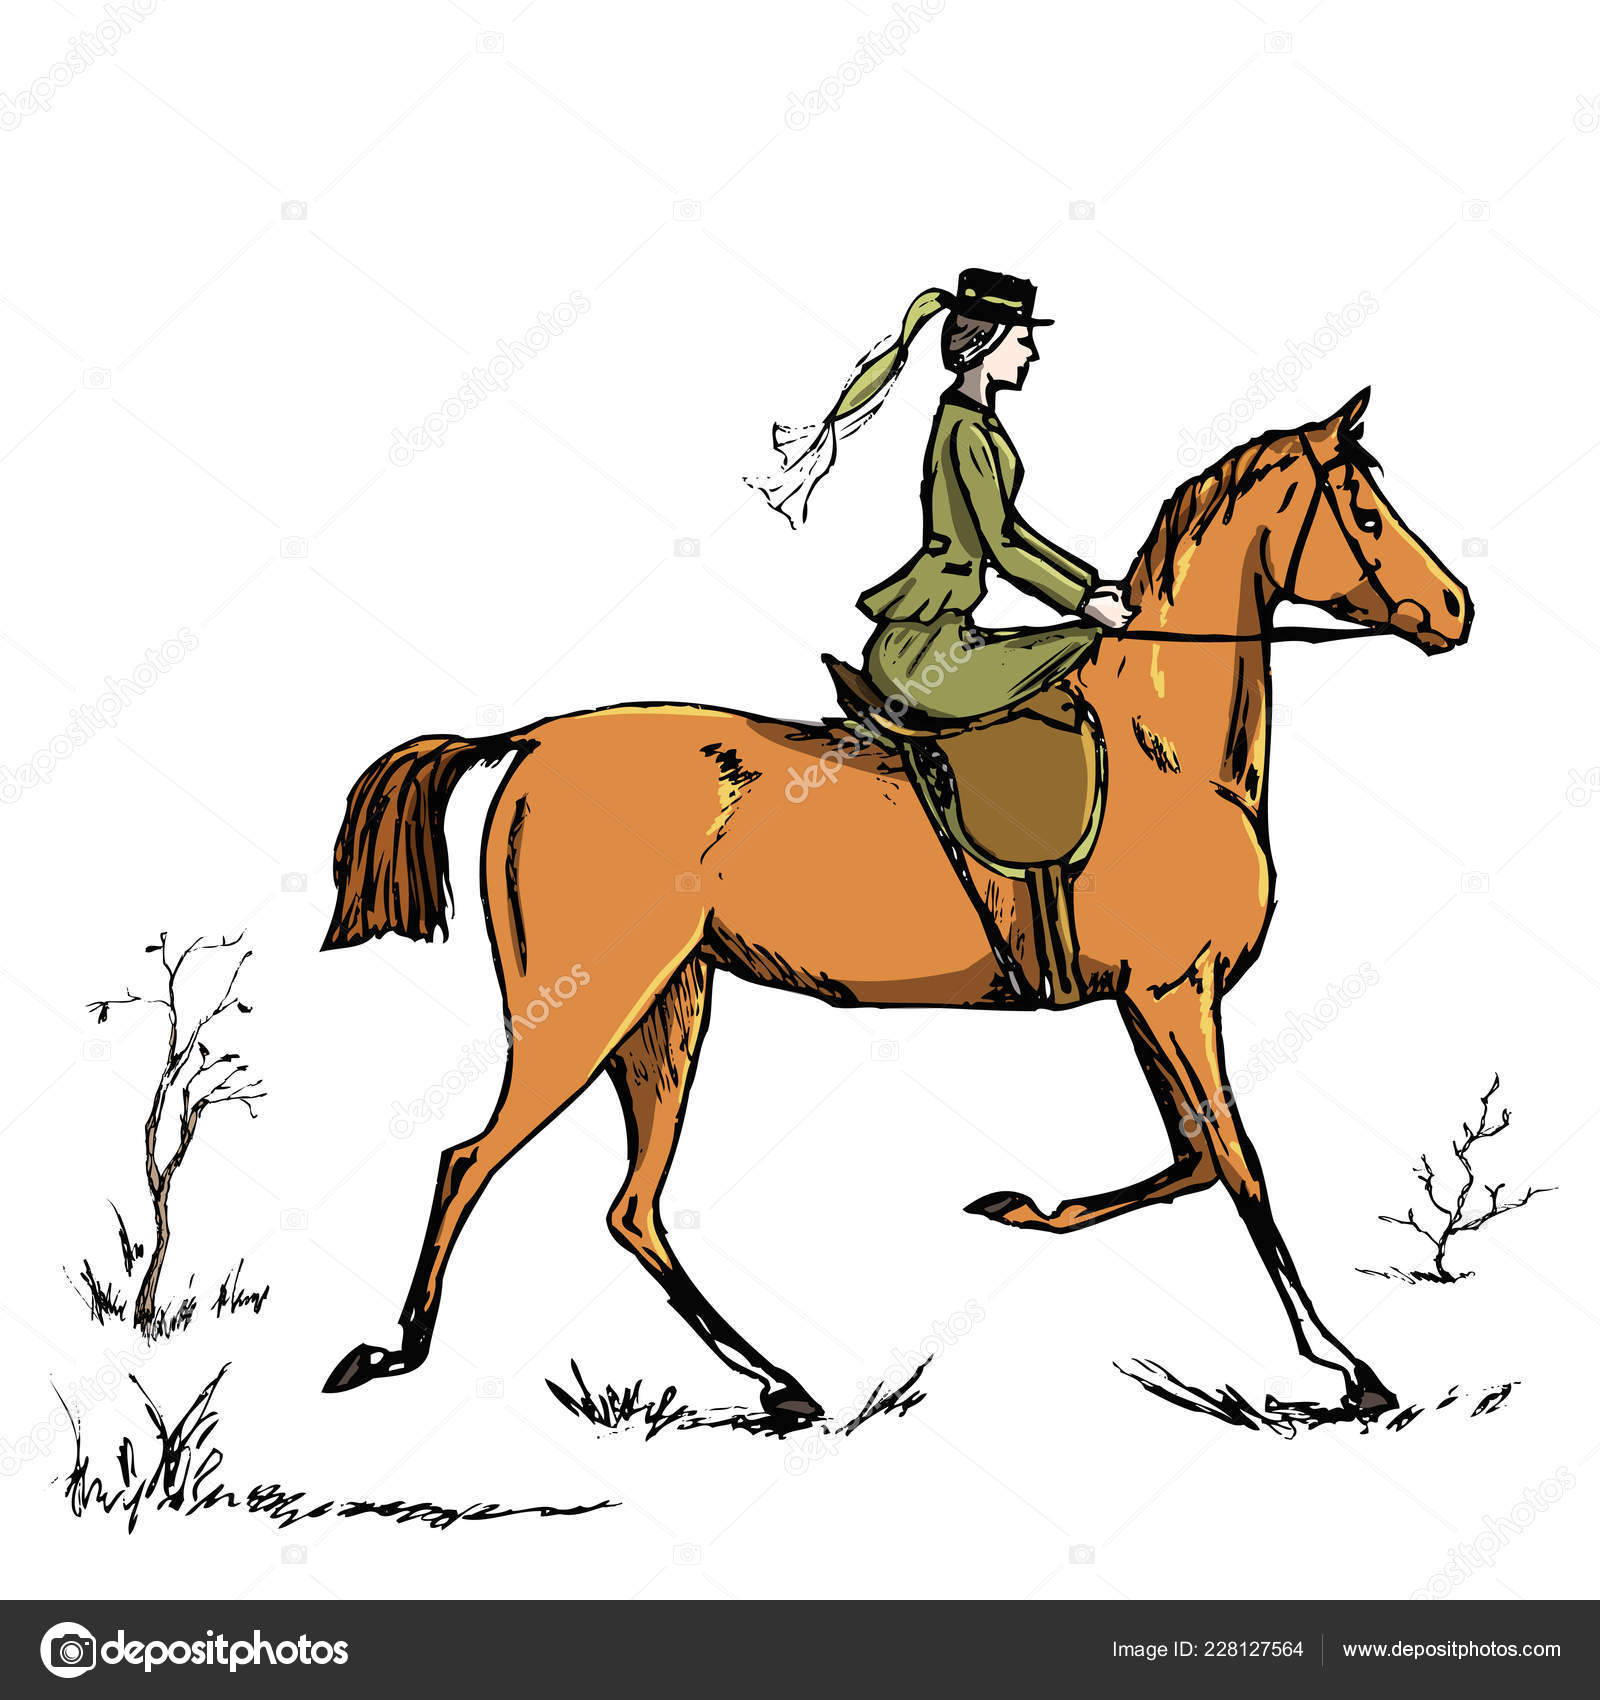 Horsewoman Horse Rider English Style Historic Horseback Lady Riding Habit Stock Vector C Larisa Zorina 228127564